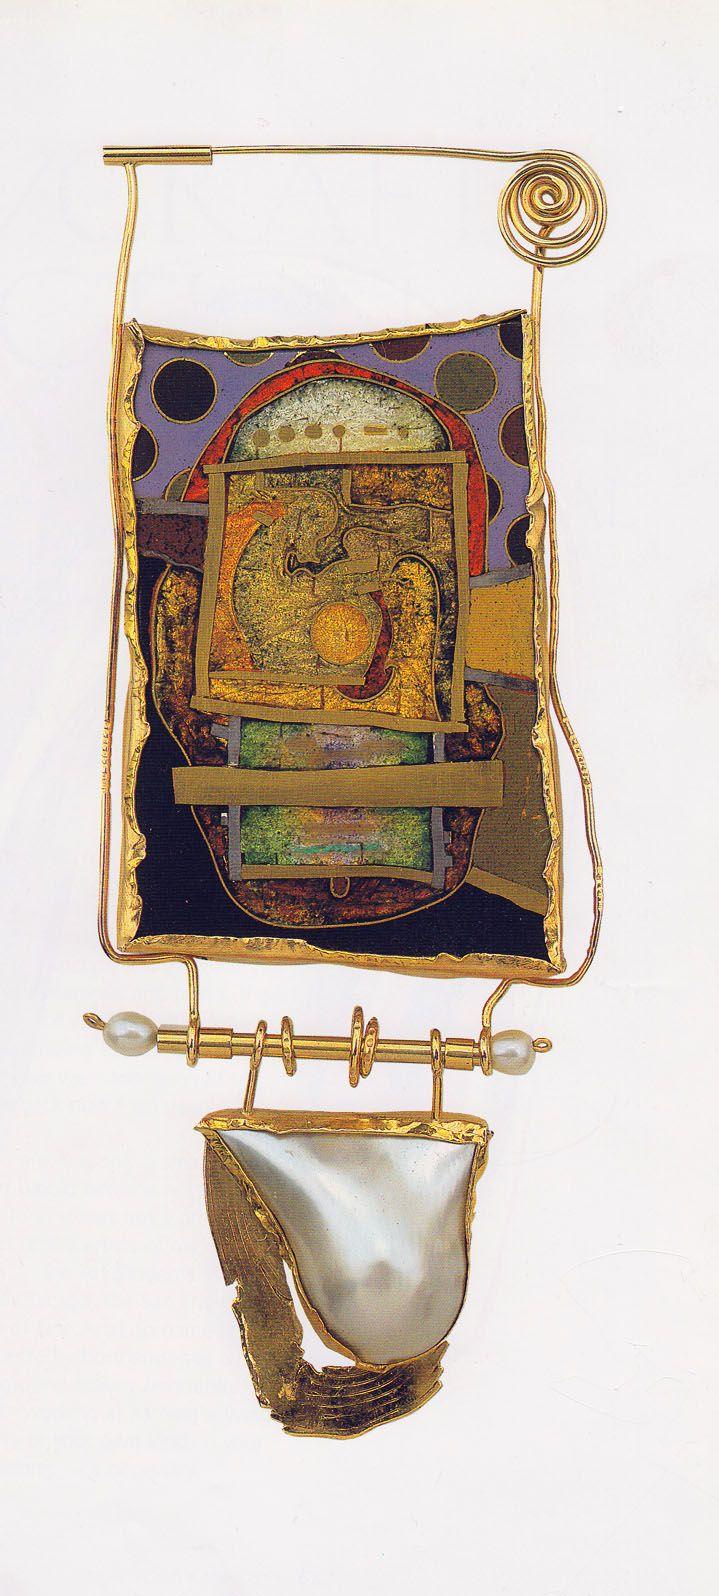 william harper ENCLOSED TATTOO 1981 Gold cloisonne' enamel on copper w/ golden silver foil; 14 kt gold; sterling silver; pearl